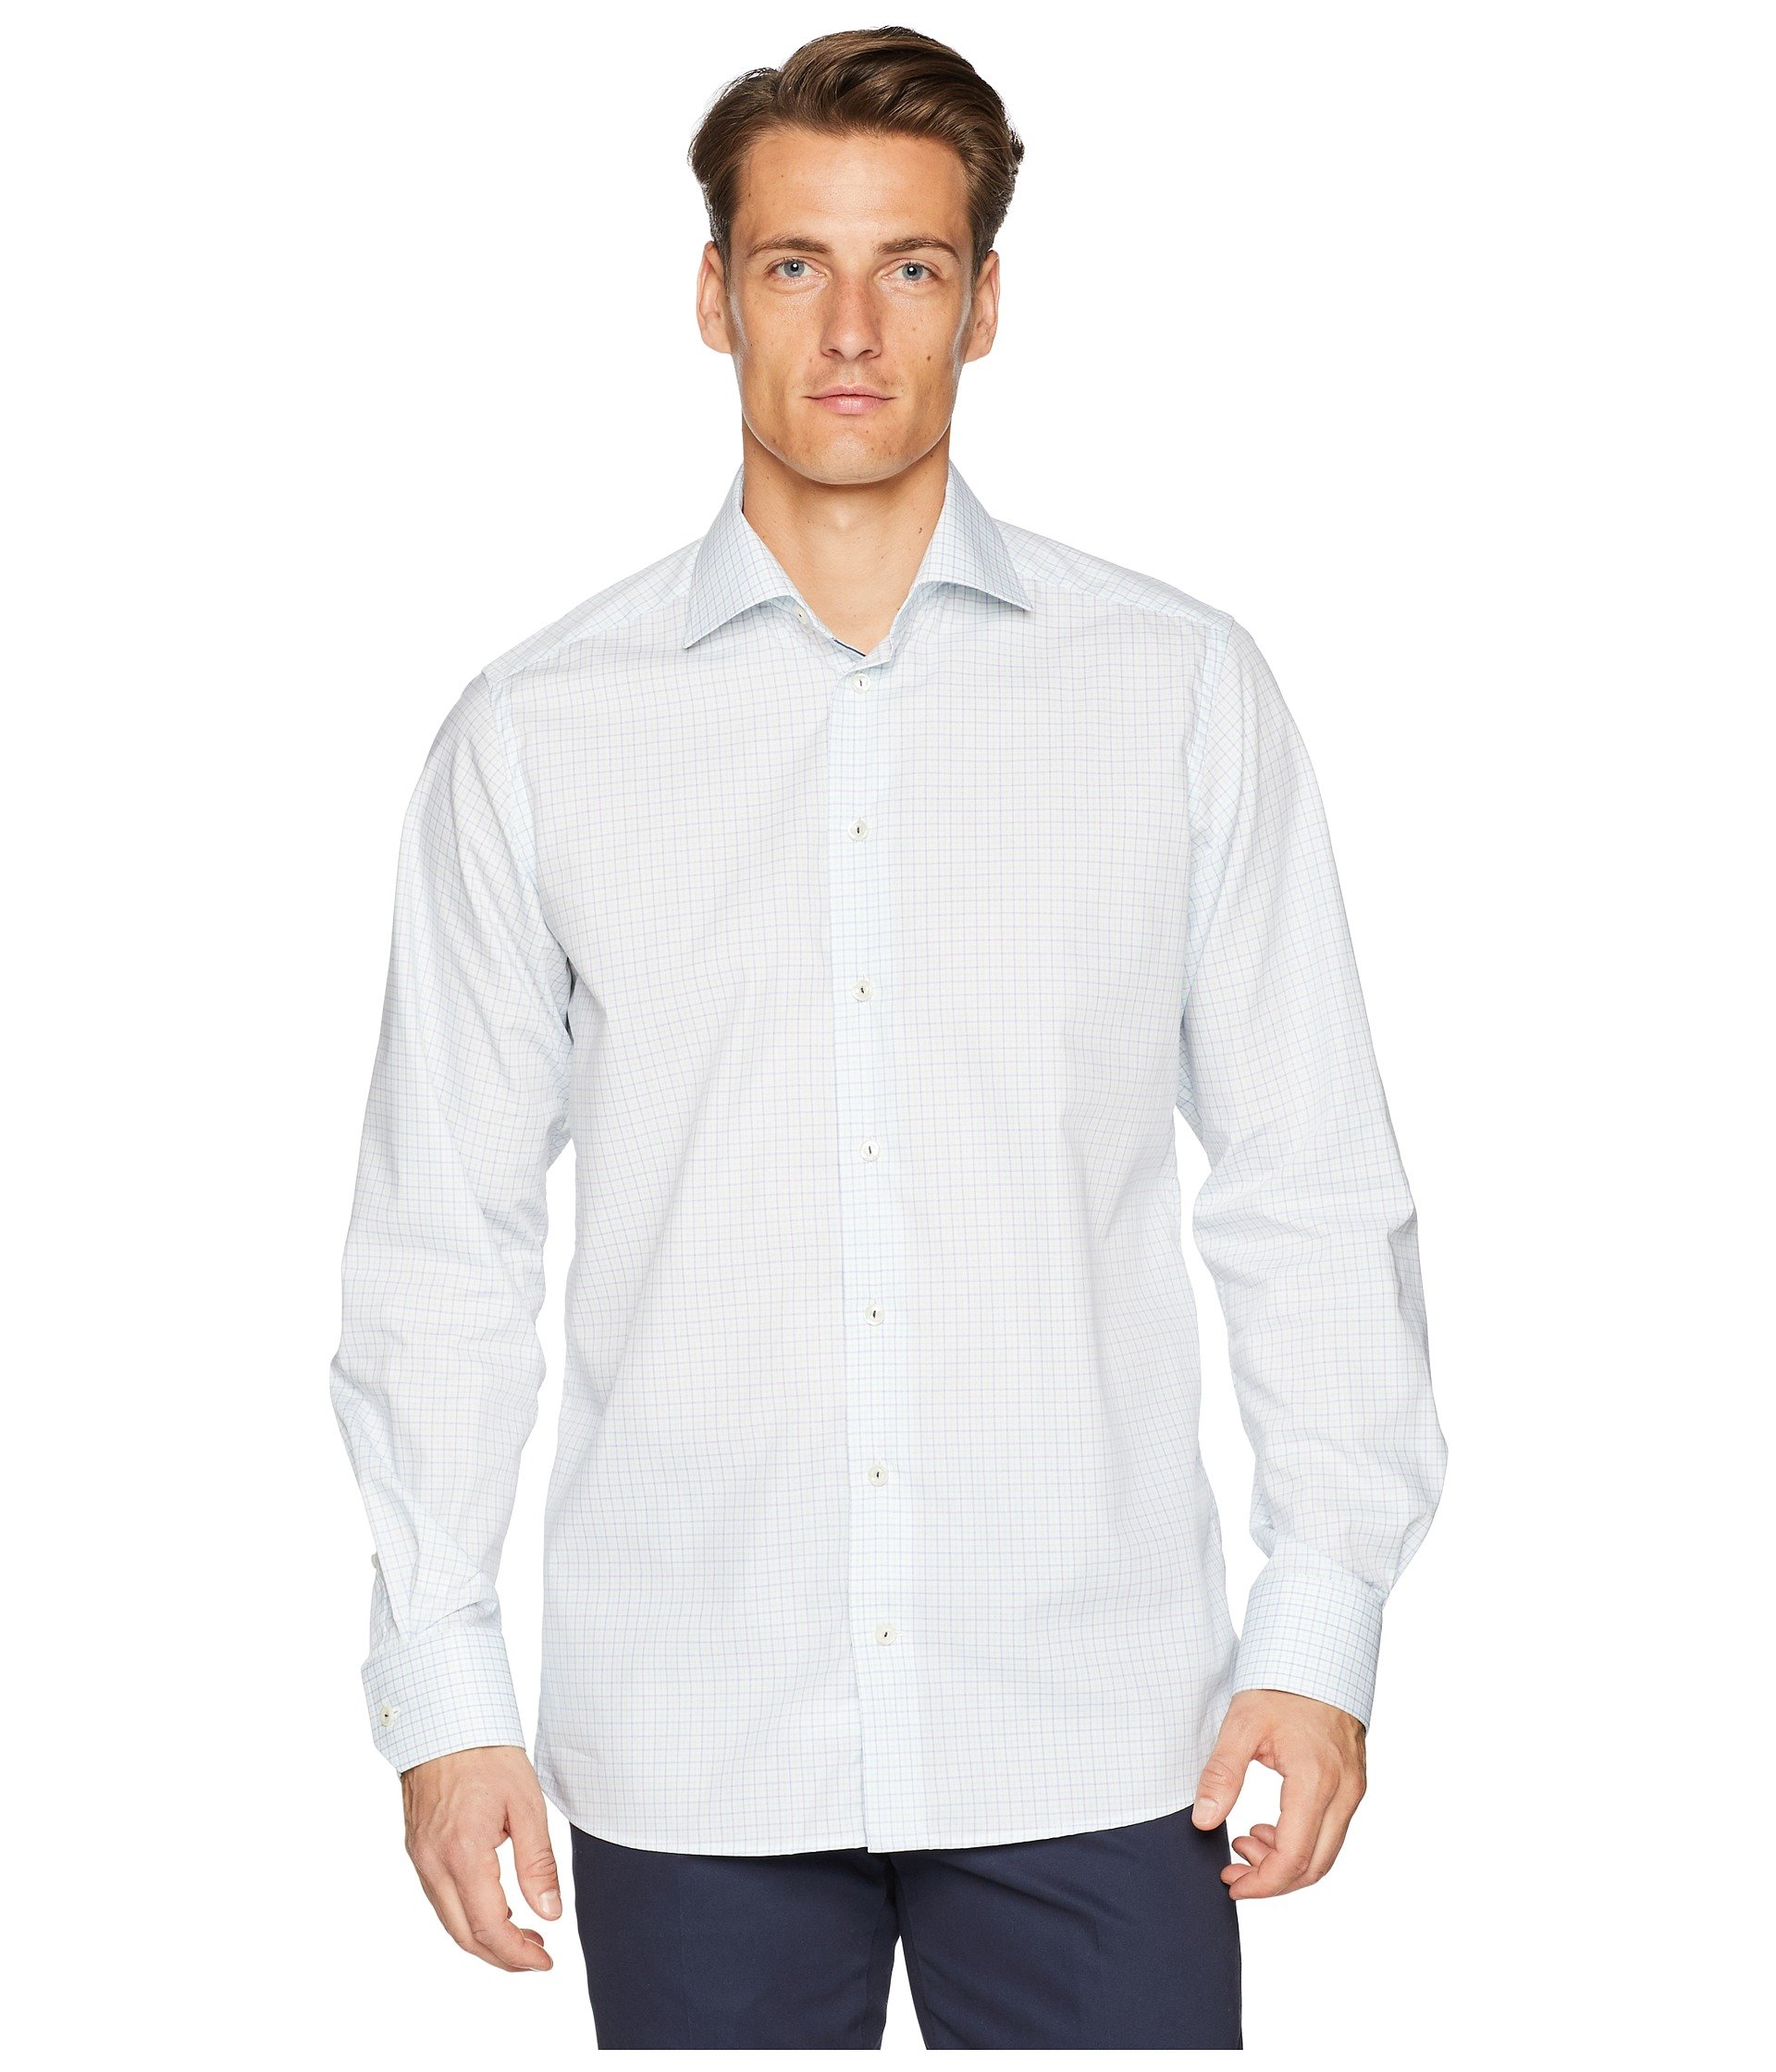 Plaid Fit Shirt Spring Eton blue Green Contemporary q5nTn0vt